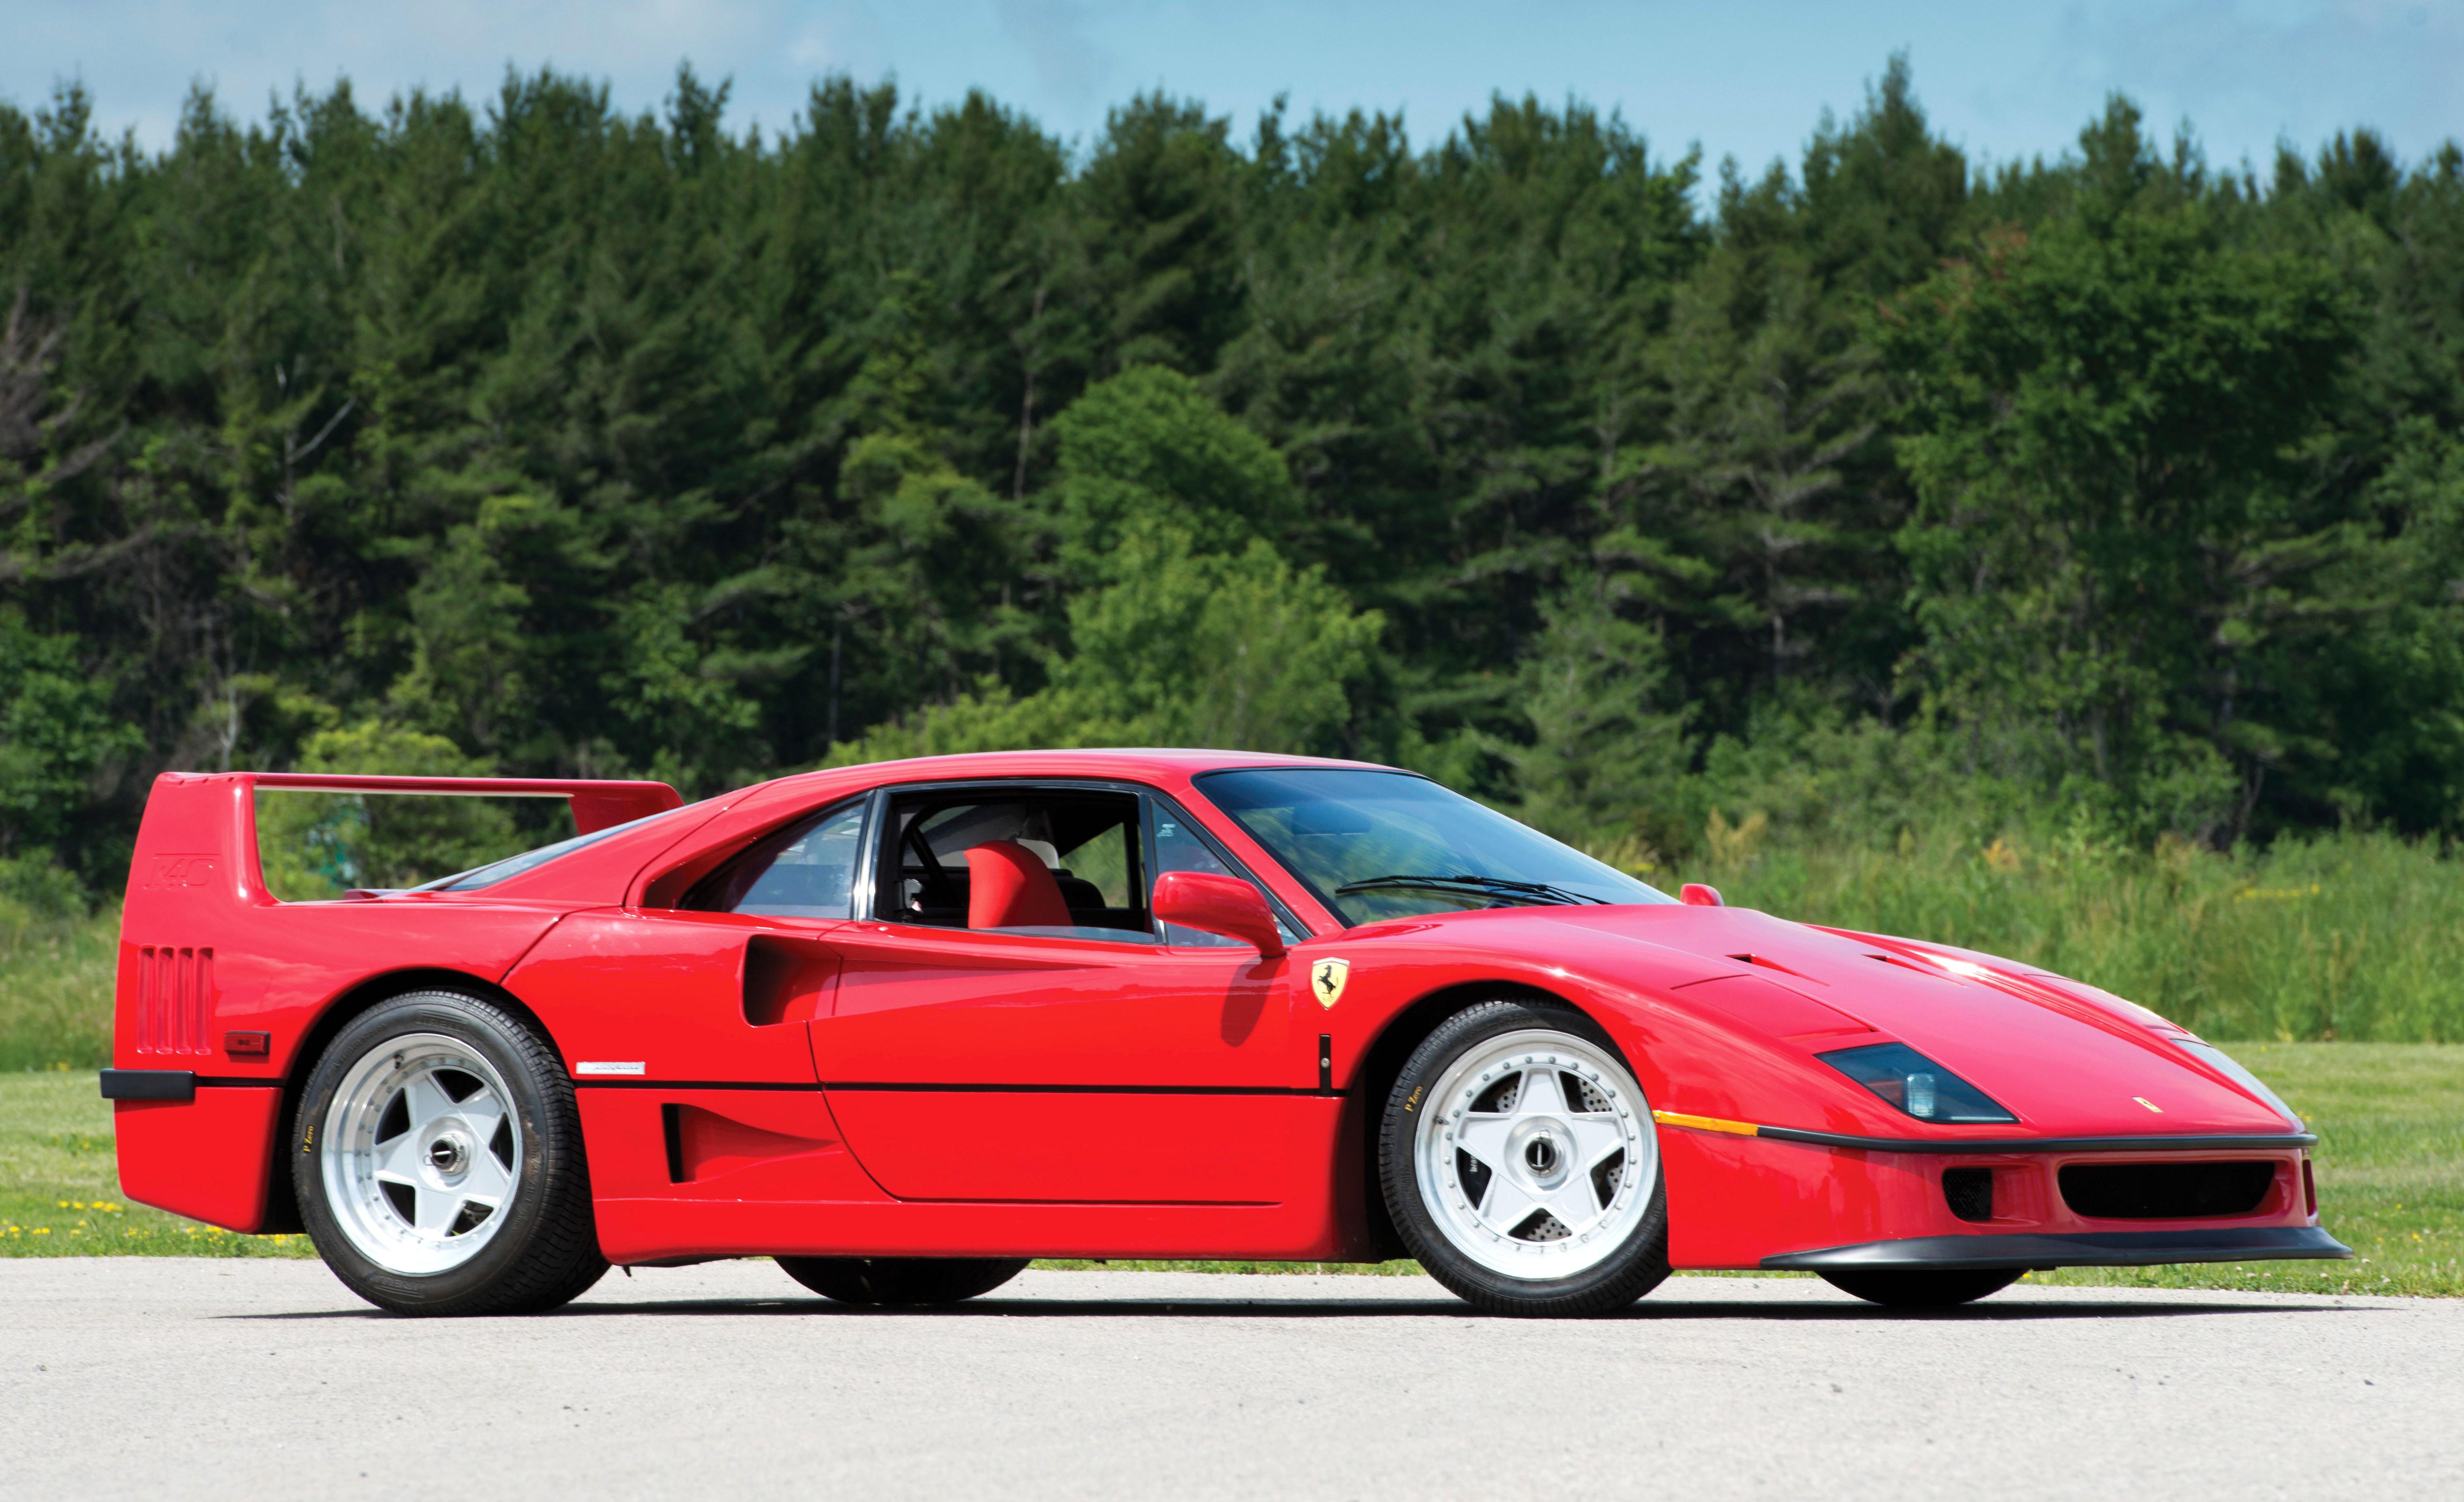 The first production car to hit 200mph the 1987 ferrari f40 ferrari f40 photo topmarques vanachro Choice Image